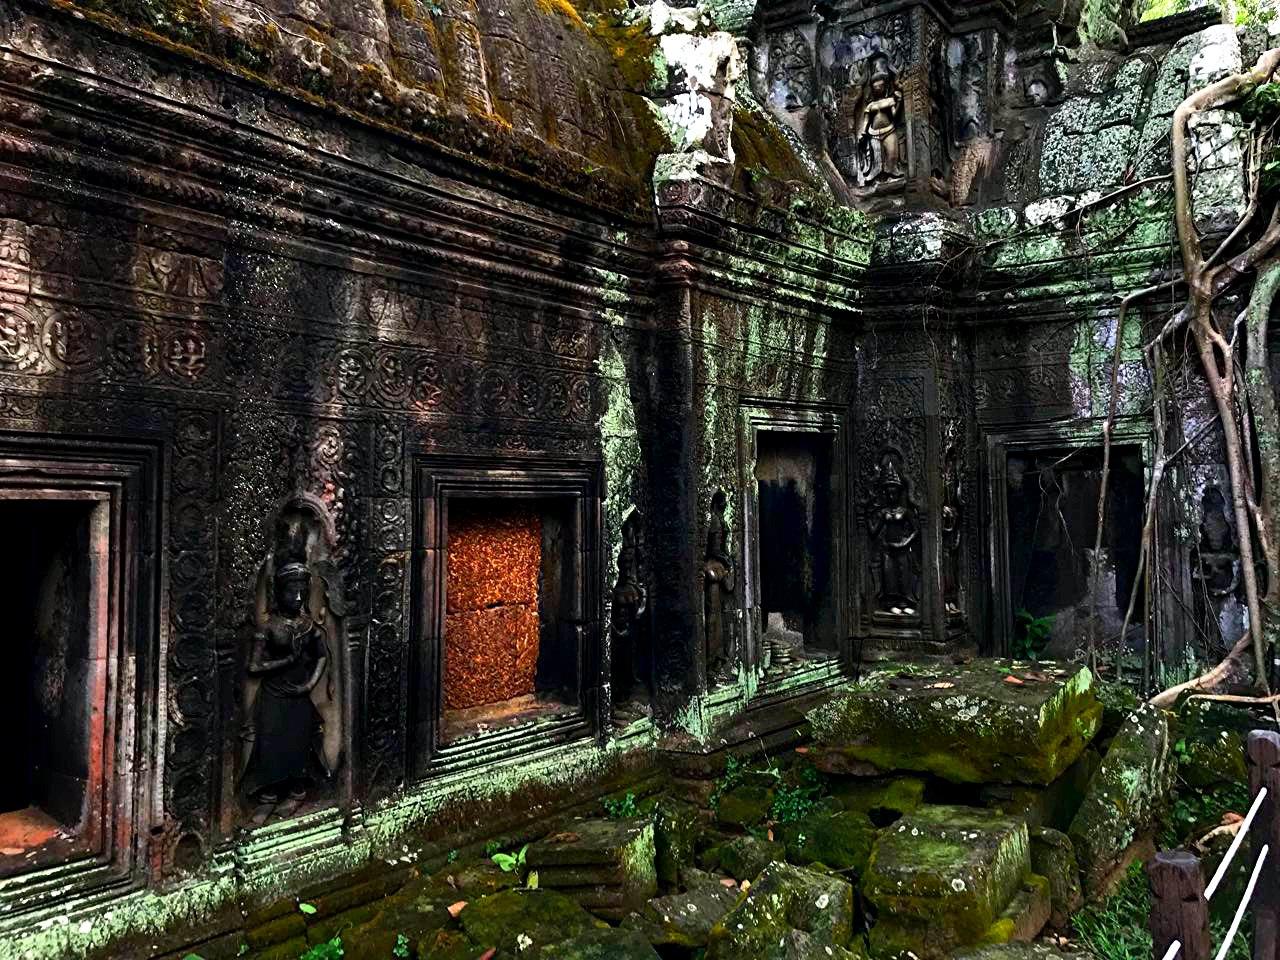 Елена Руденко (Валтея). Камбоджа. Ангкор. Efp3OHVJ4x0